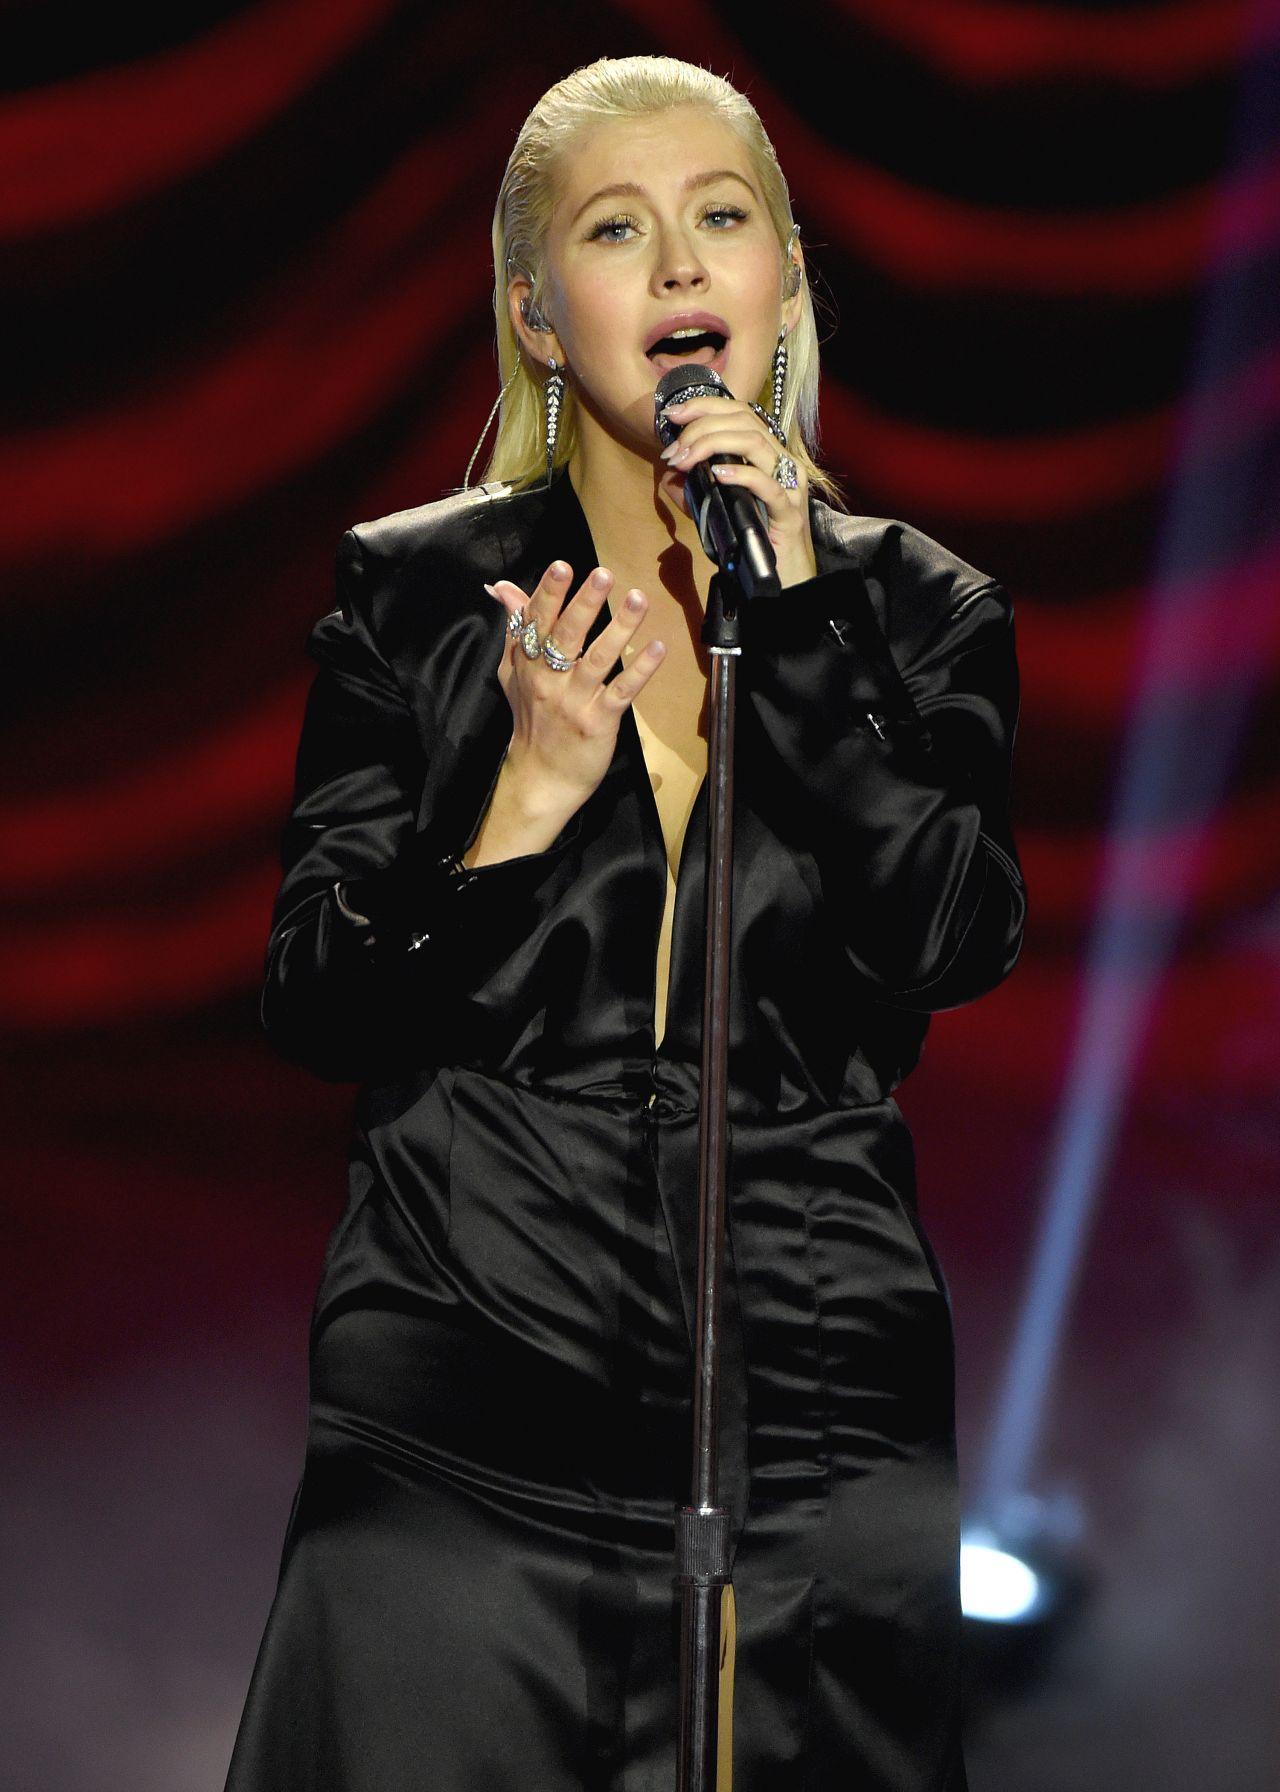 http://celebmafia.com/wp-content/uploads/2017/11/christina-aguilera-performs-live-at-the-2017-american-music-awards-in-la-5.jpg